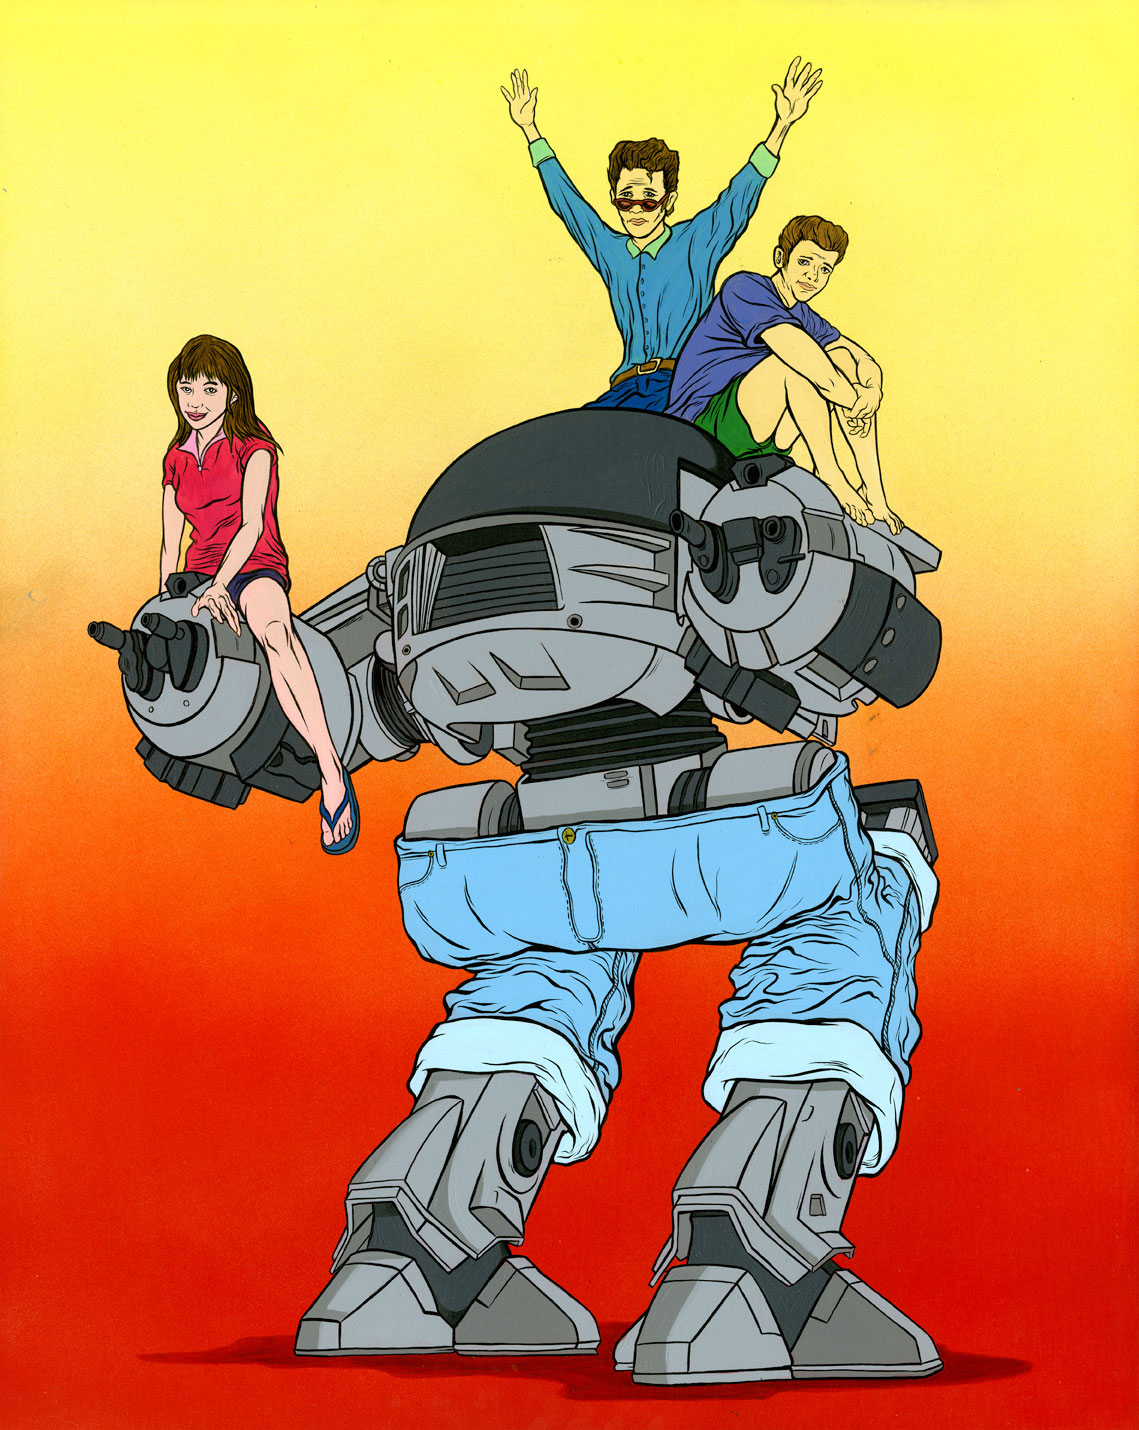 ED-2090210 [RoboCop X Beverly Hills 90210 Mashup Art]